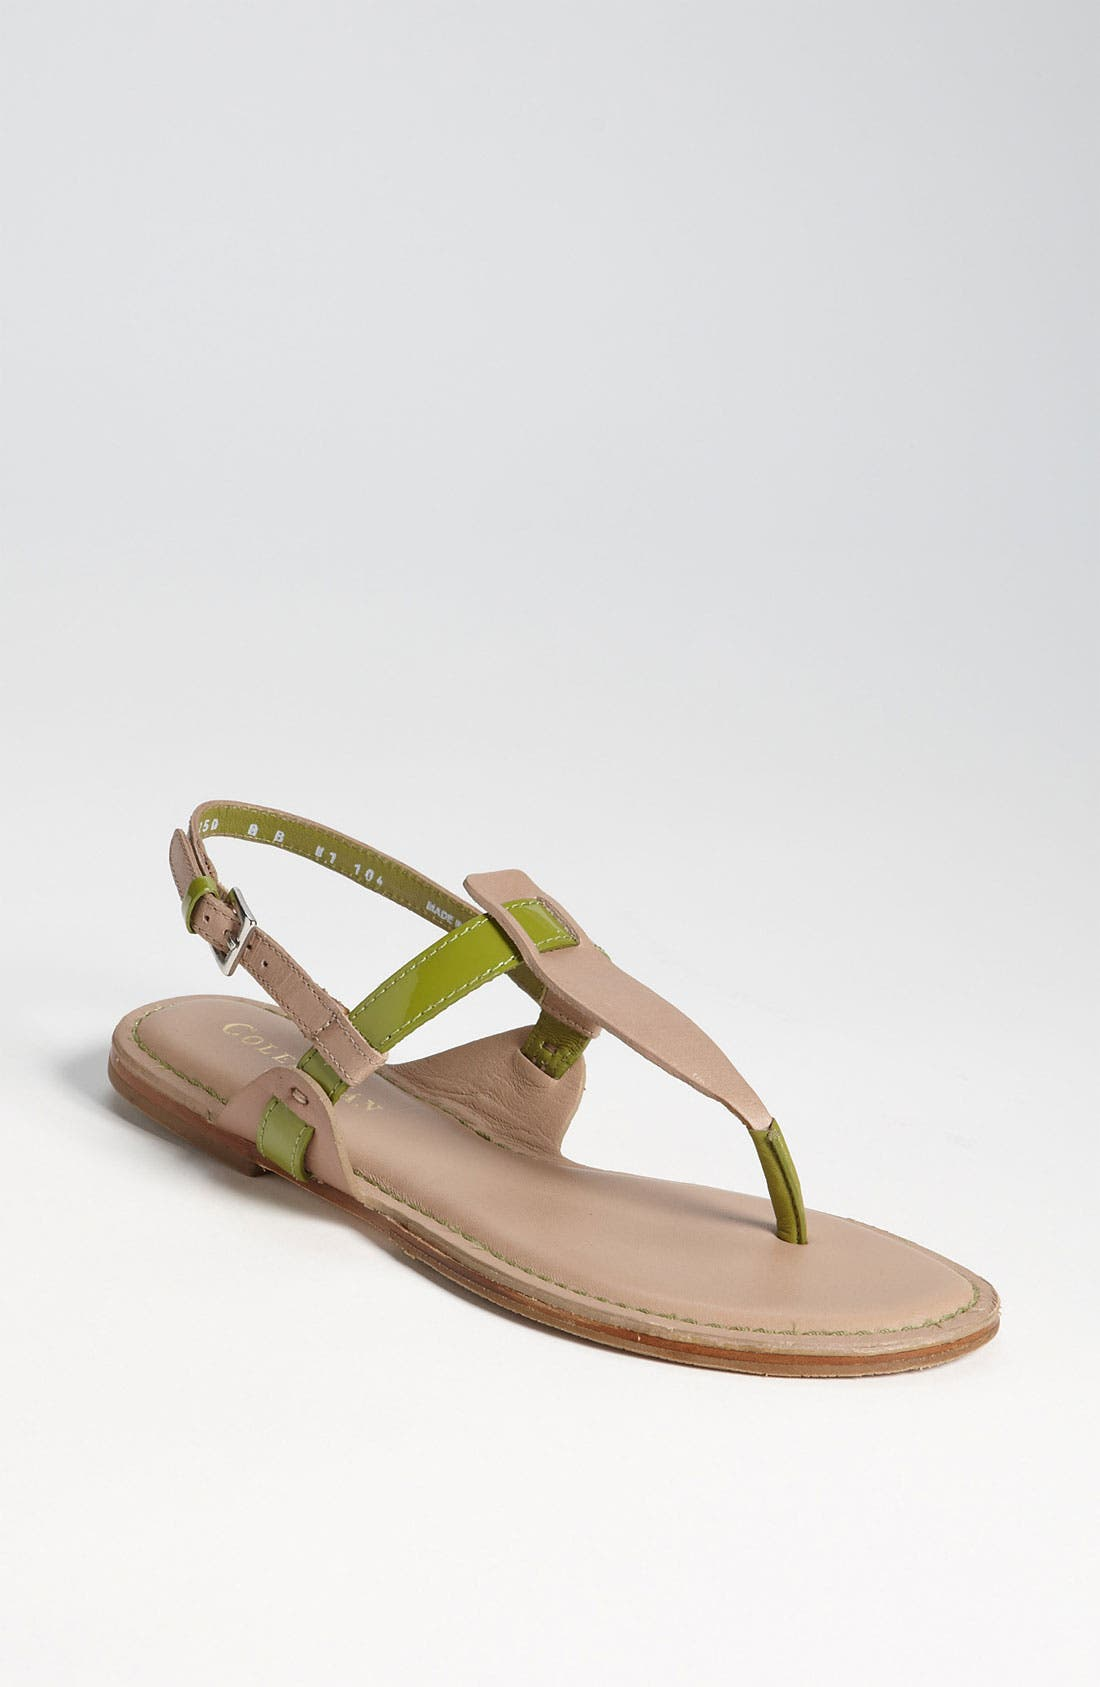 Alternate Image 1 Selected - Cole Haan 'Air Bridget' Sandal